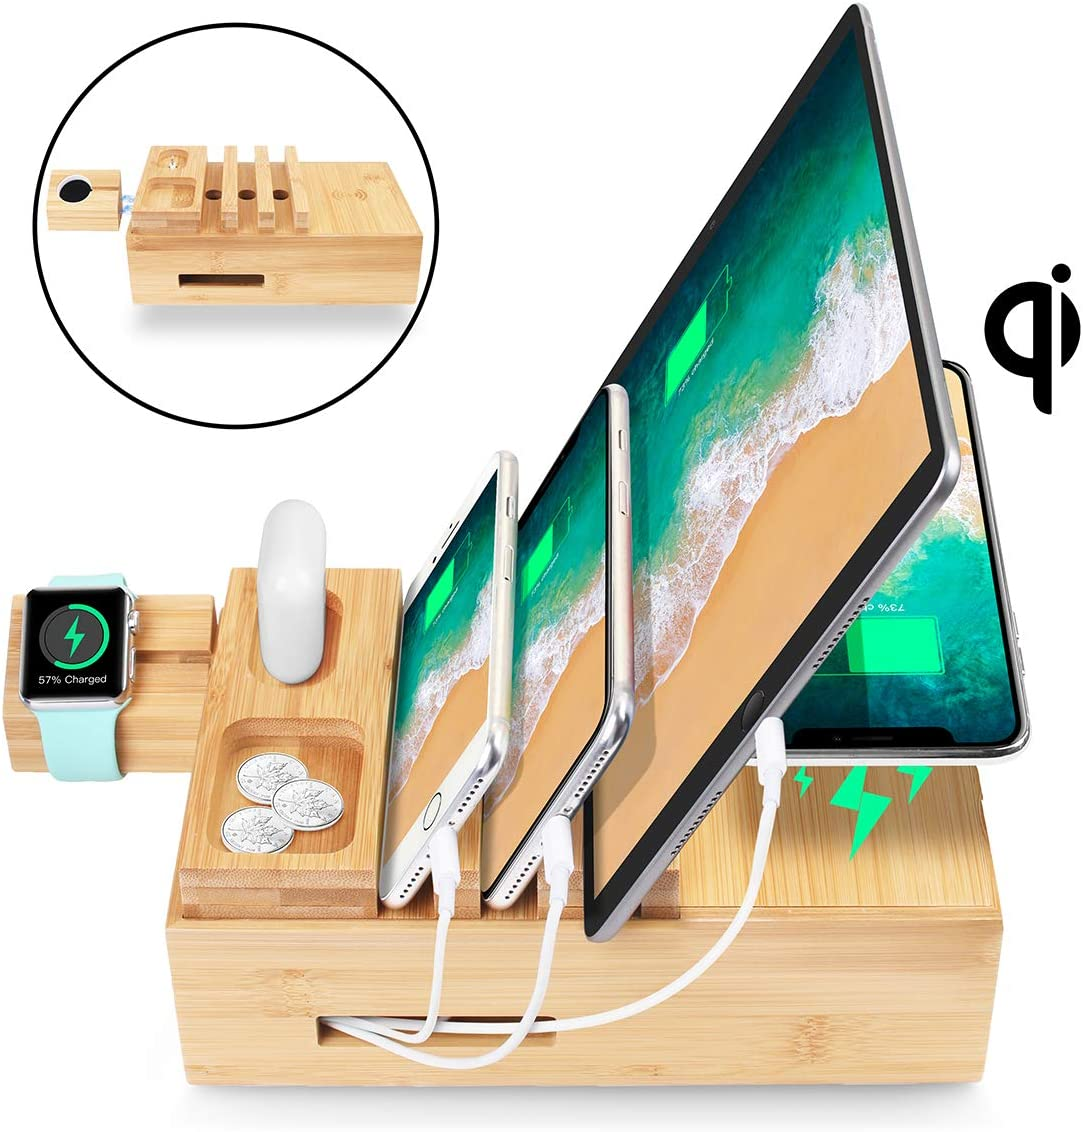 AICase Estación de Carga USB Cargador de Escritorio Multifunción de 5 Puertos con Qi Cargador Inalambrico Base de Carga para iPhone Samsungs Huawei iPods Airpods Iwatch y Kindle